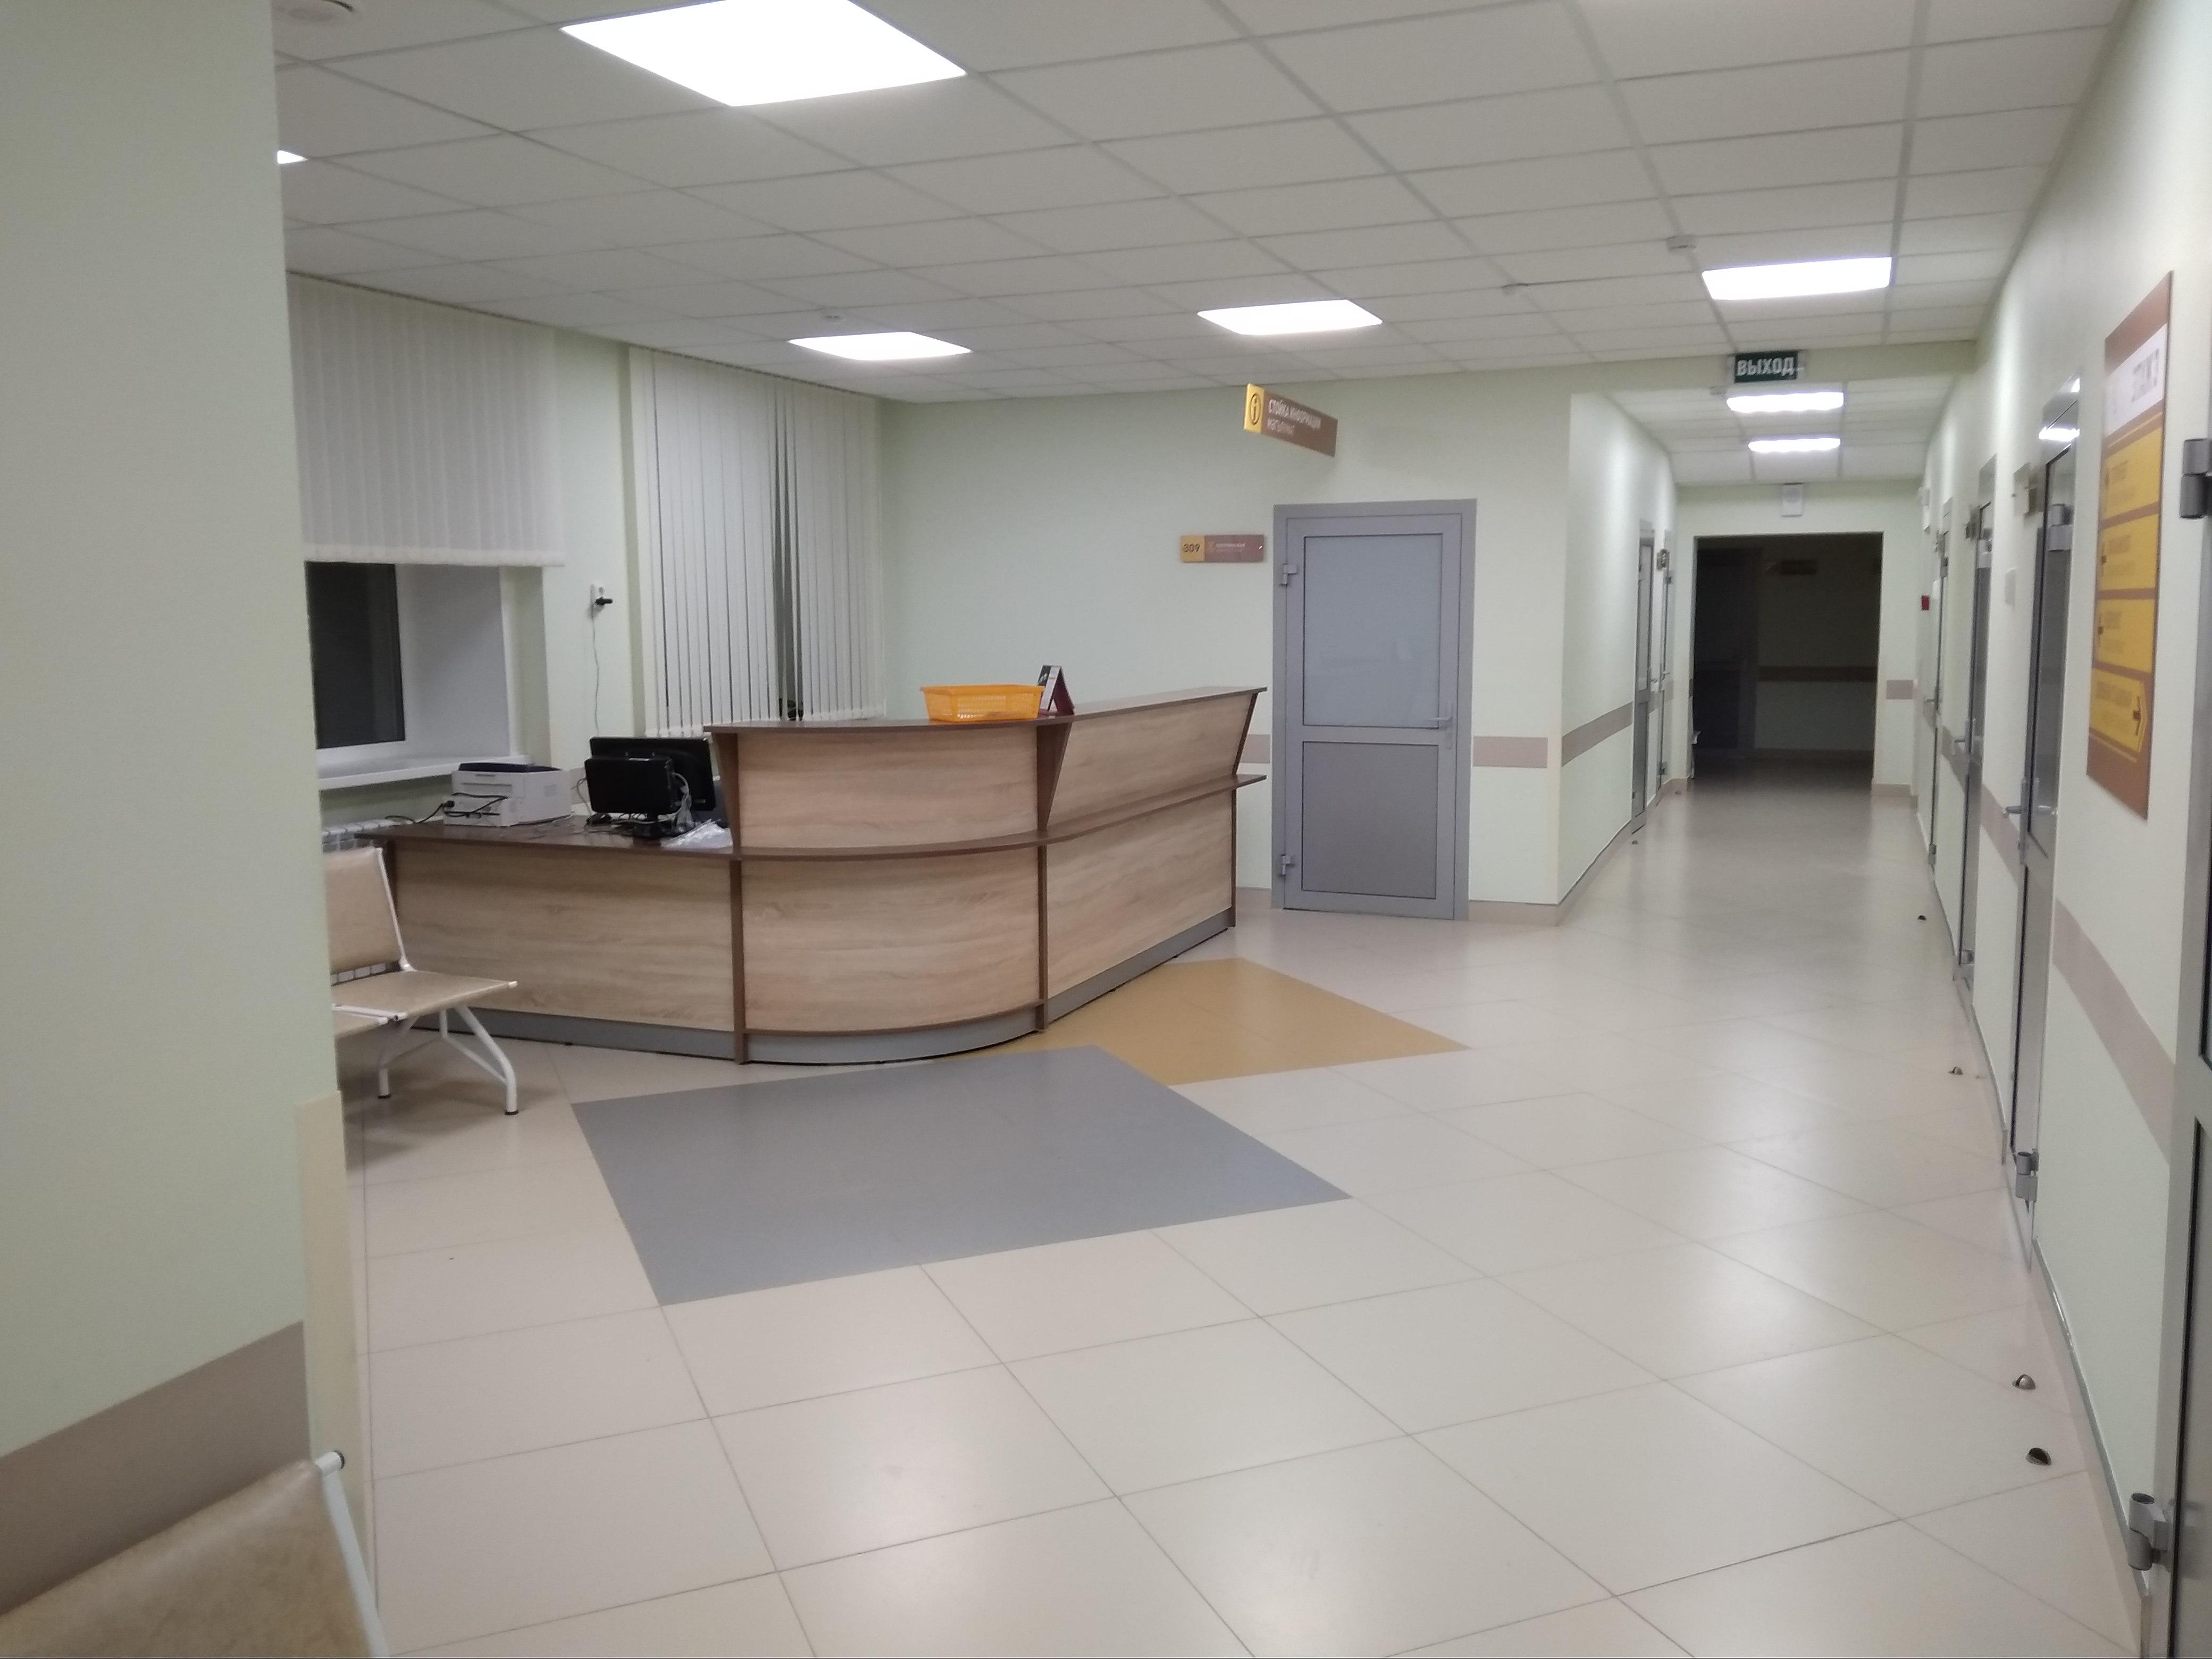 1-я поликлиника